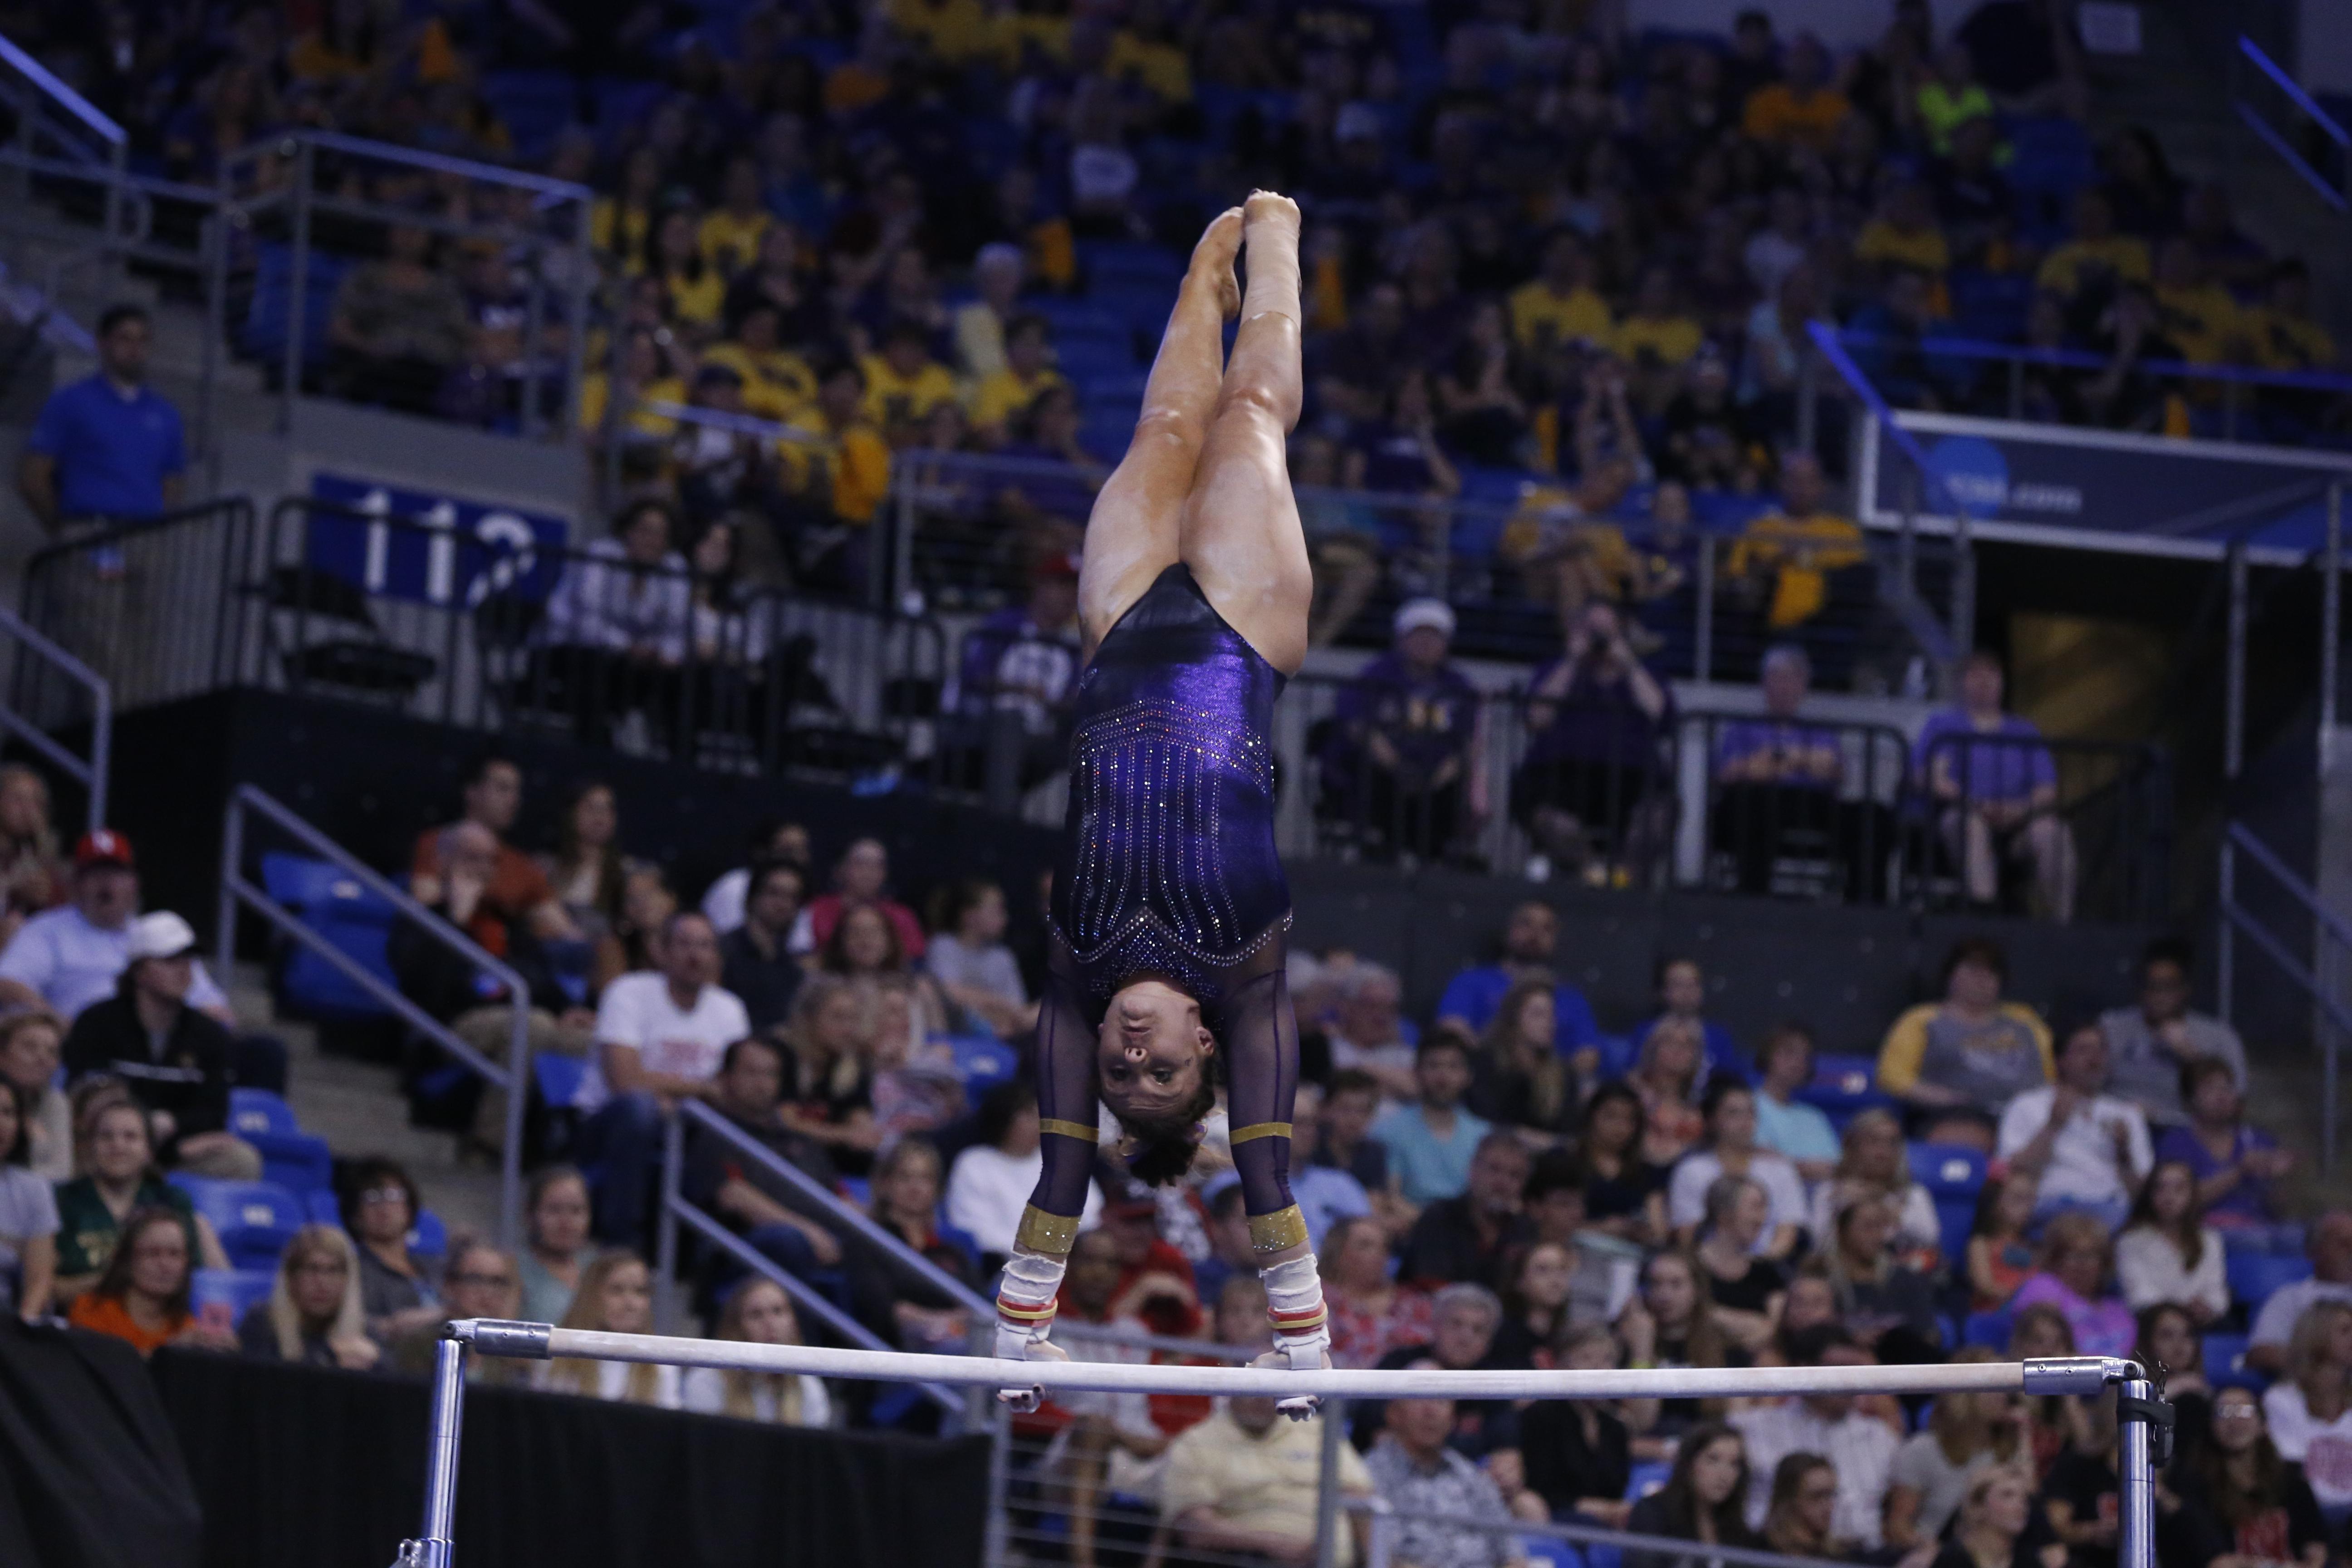 2017 NCAA Div I Women's Gymnastics Championships